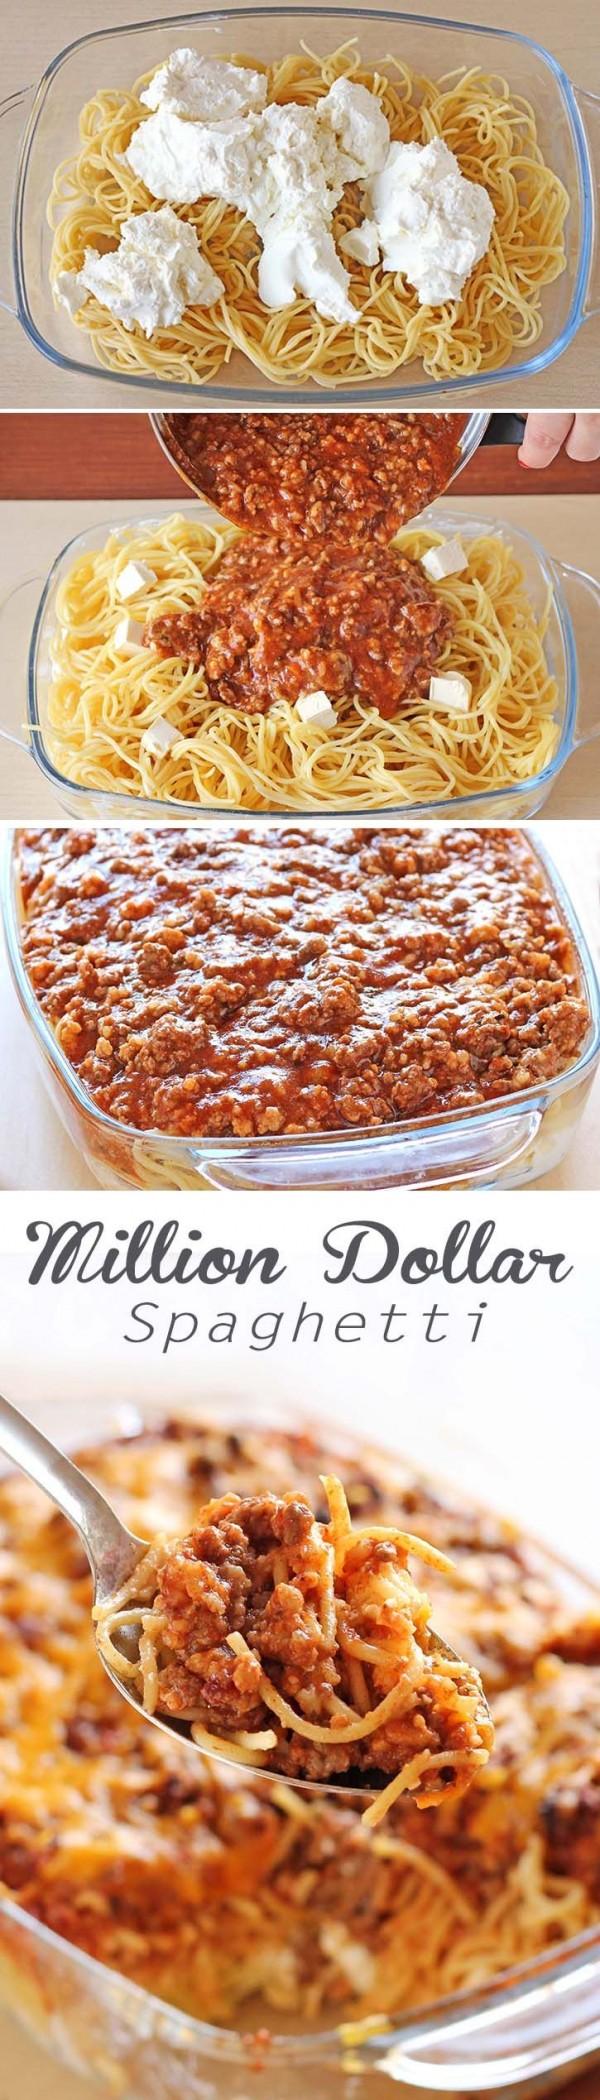 Get the recipe Million Dollar Spaghetti @recipes_to_go